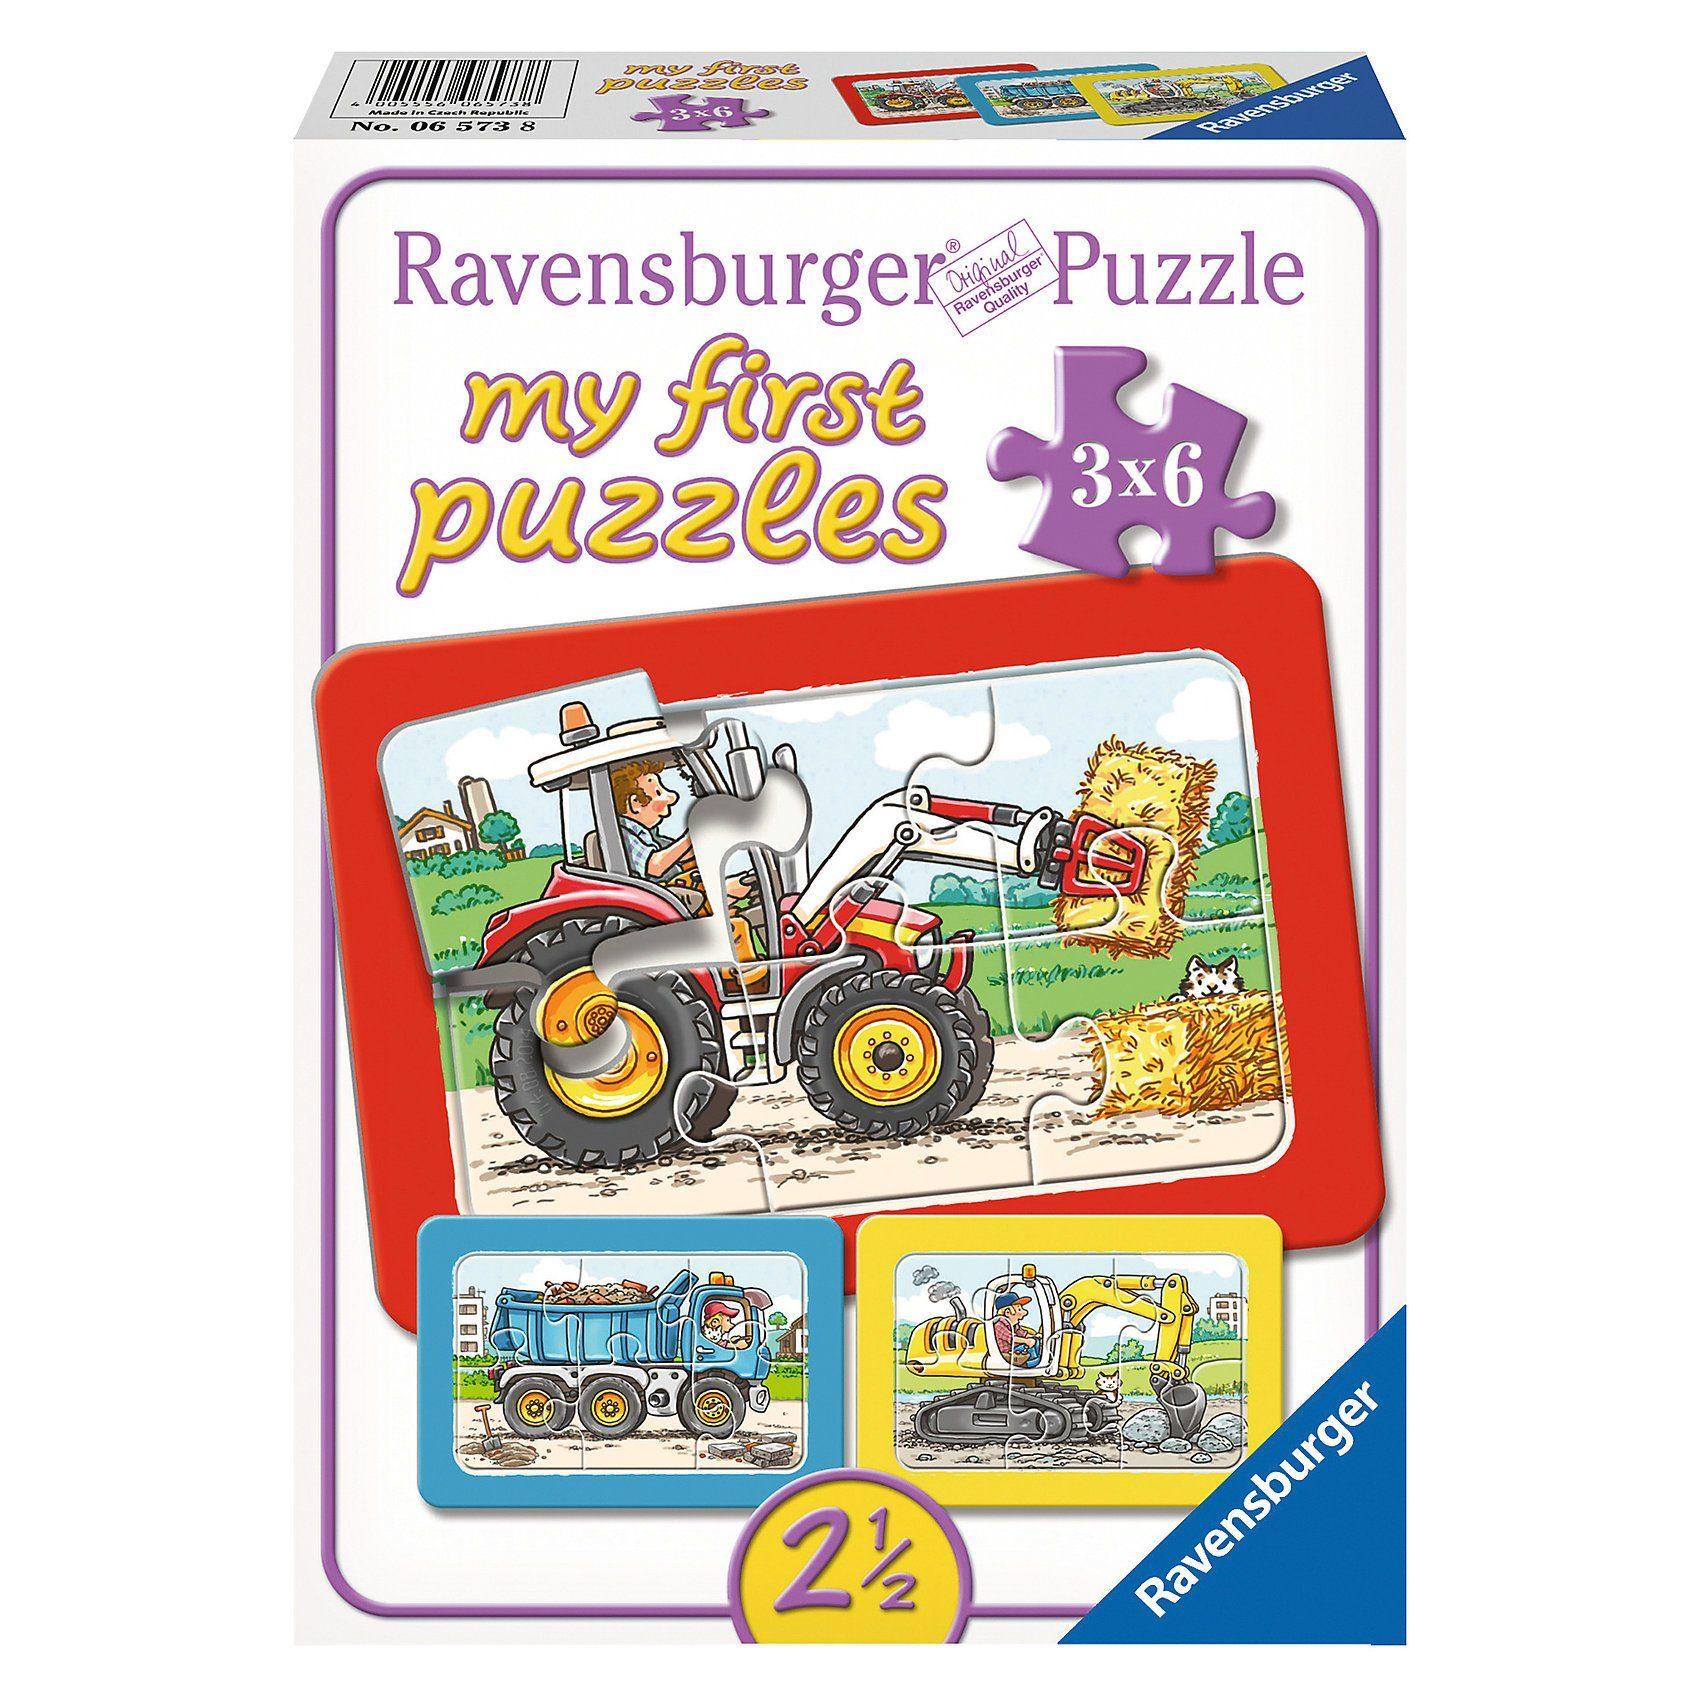 Ravensburger My first Puzzles - Rahmenpuzzle Bagger, Traktor und Kipplad